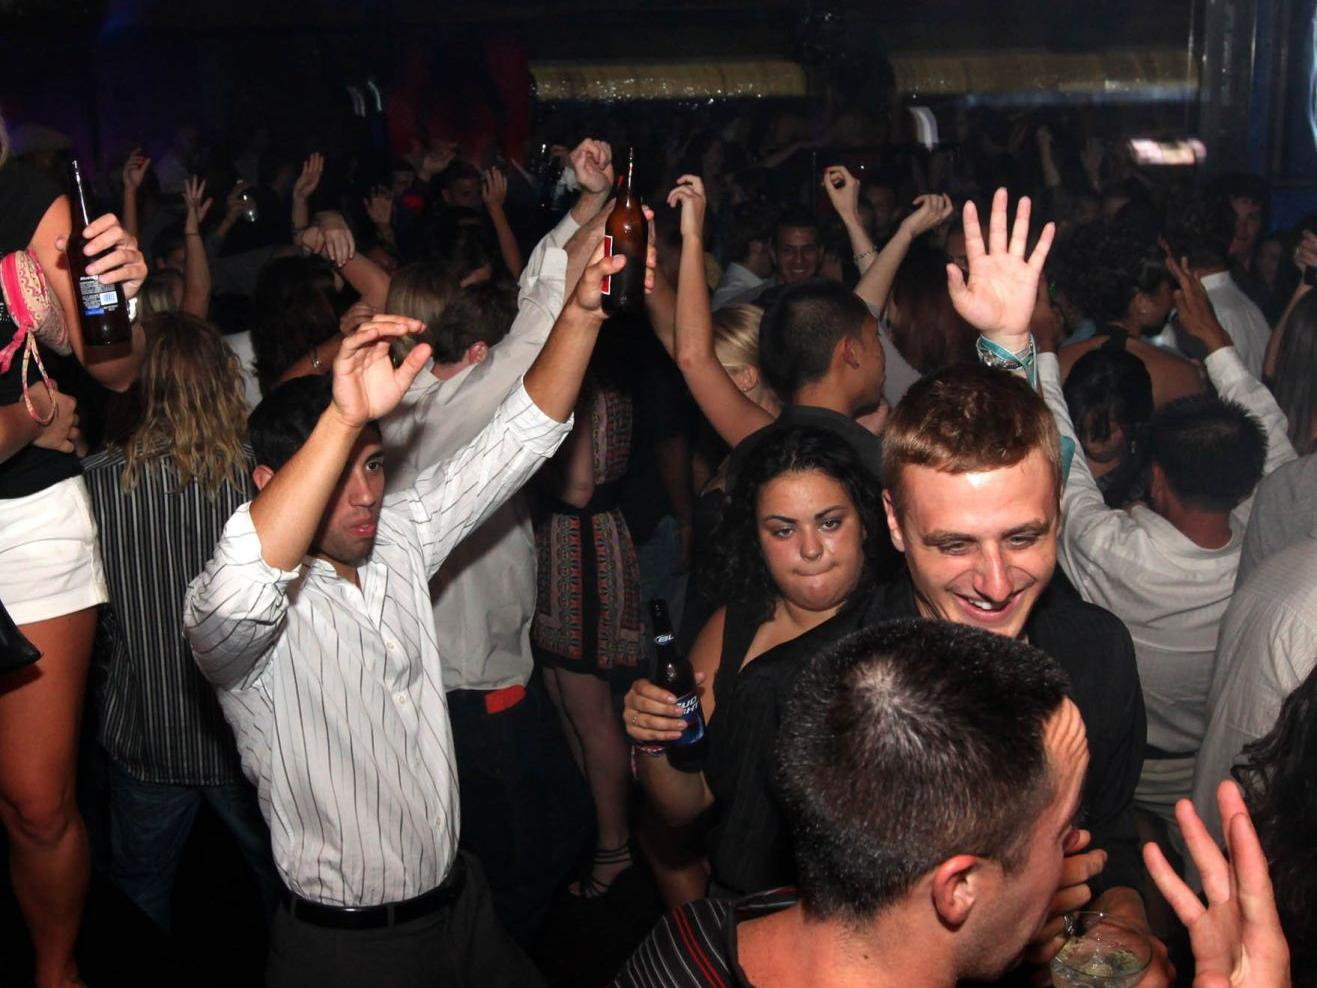 providence nighclubs at tropicana casino